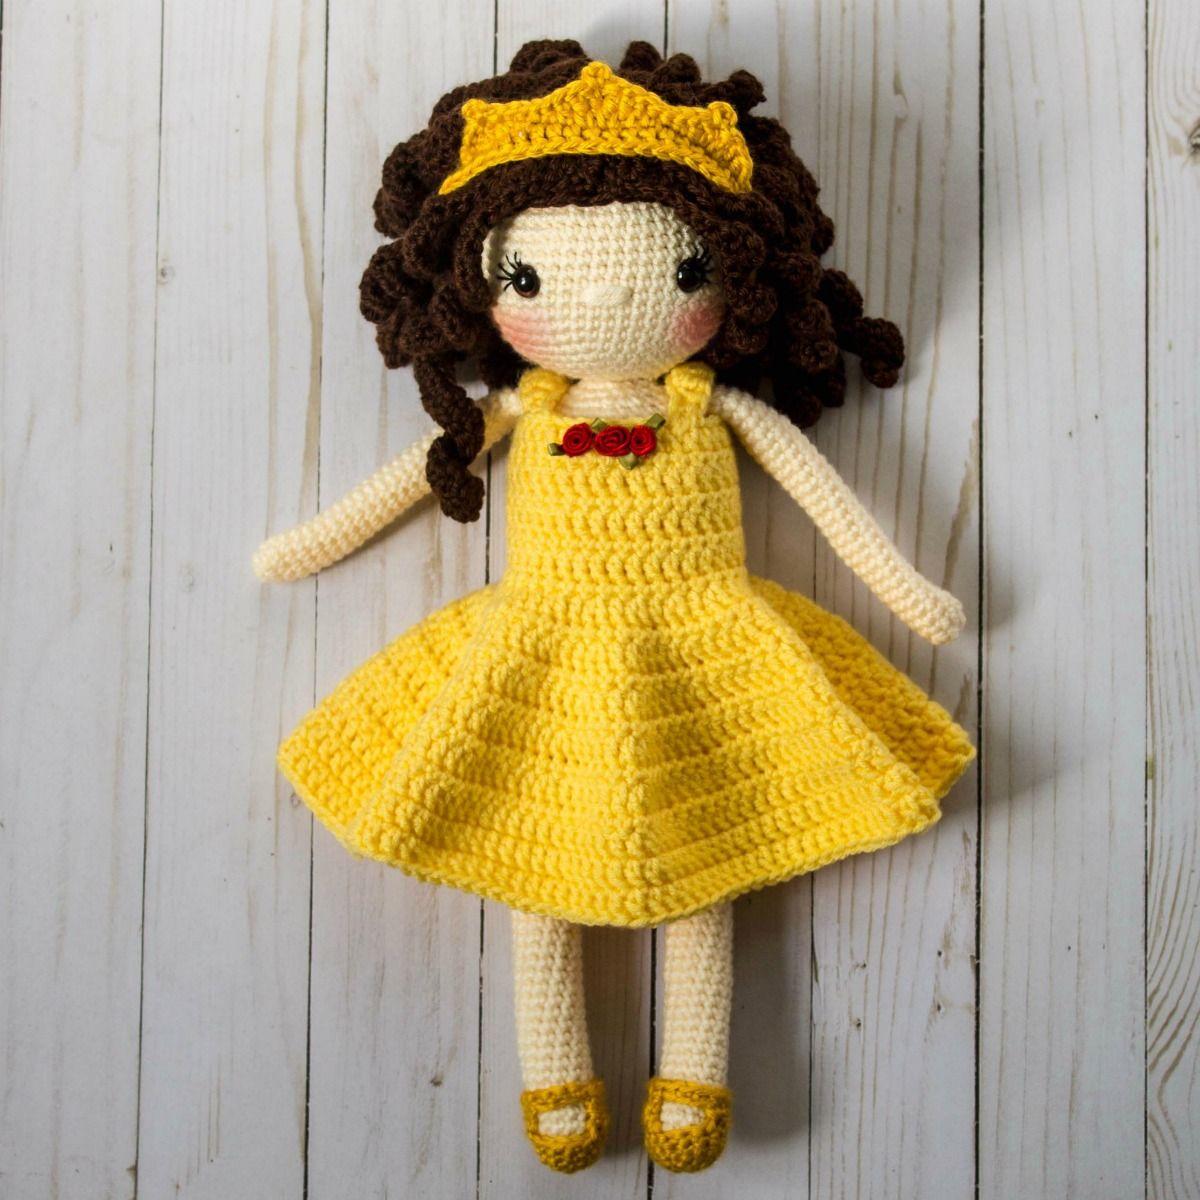 Free Crochet Doll Pattern- The Friendly Sophie | Puppen, Puppe und ...